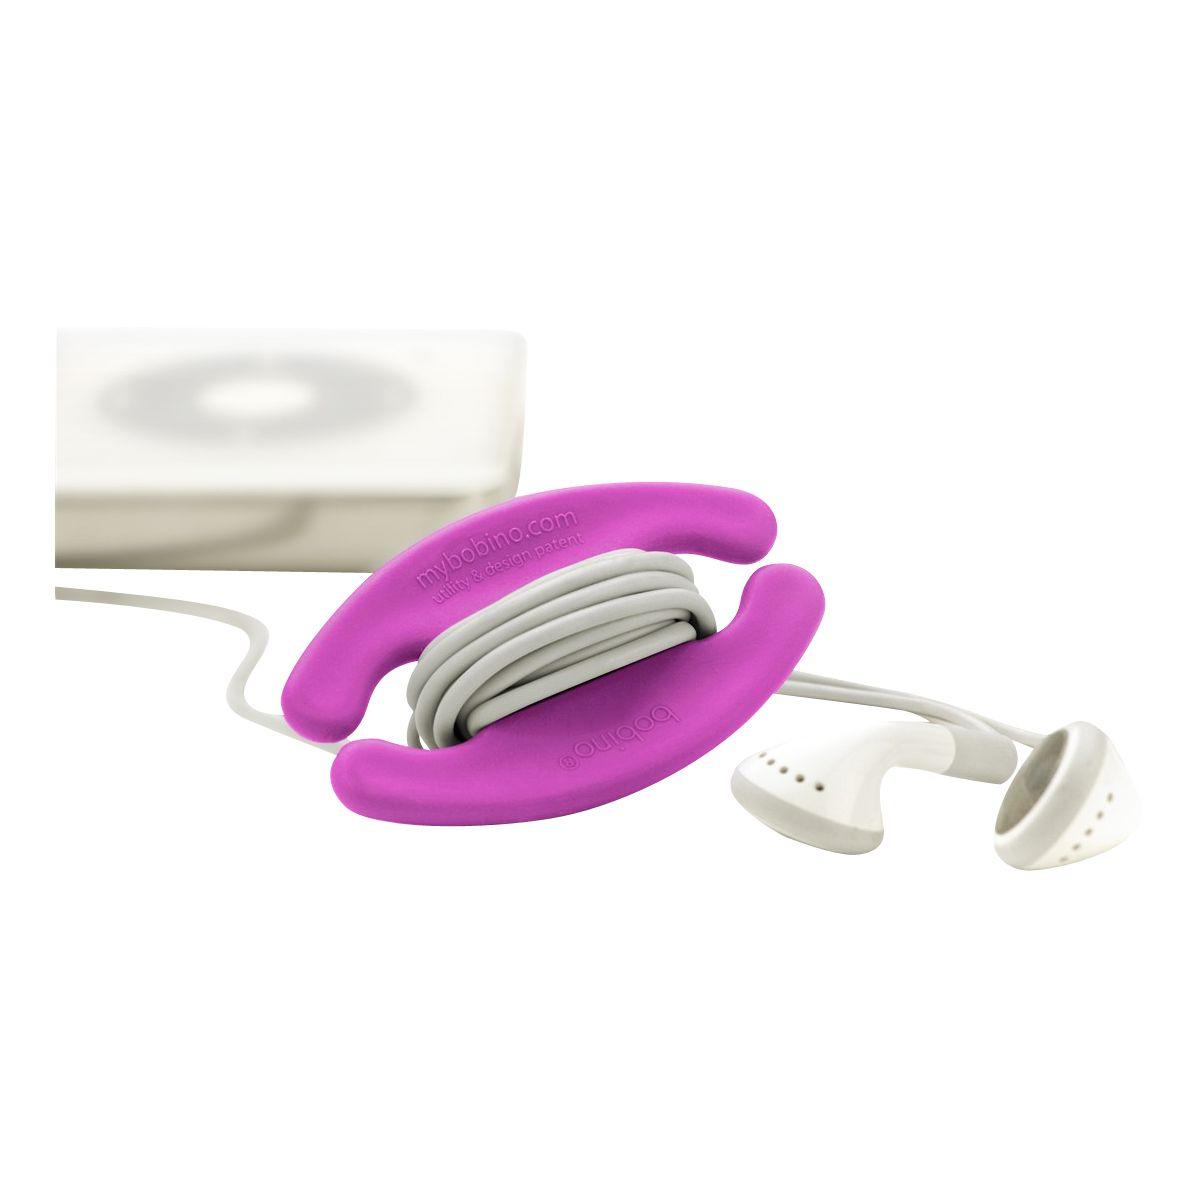 Serre-câble bobino enrouleur de cable s rose - 3% de remise immédiate avec le code : multi3 (photo)